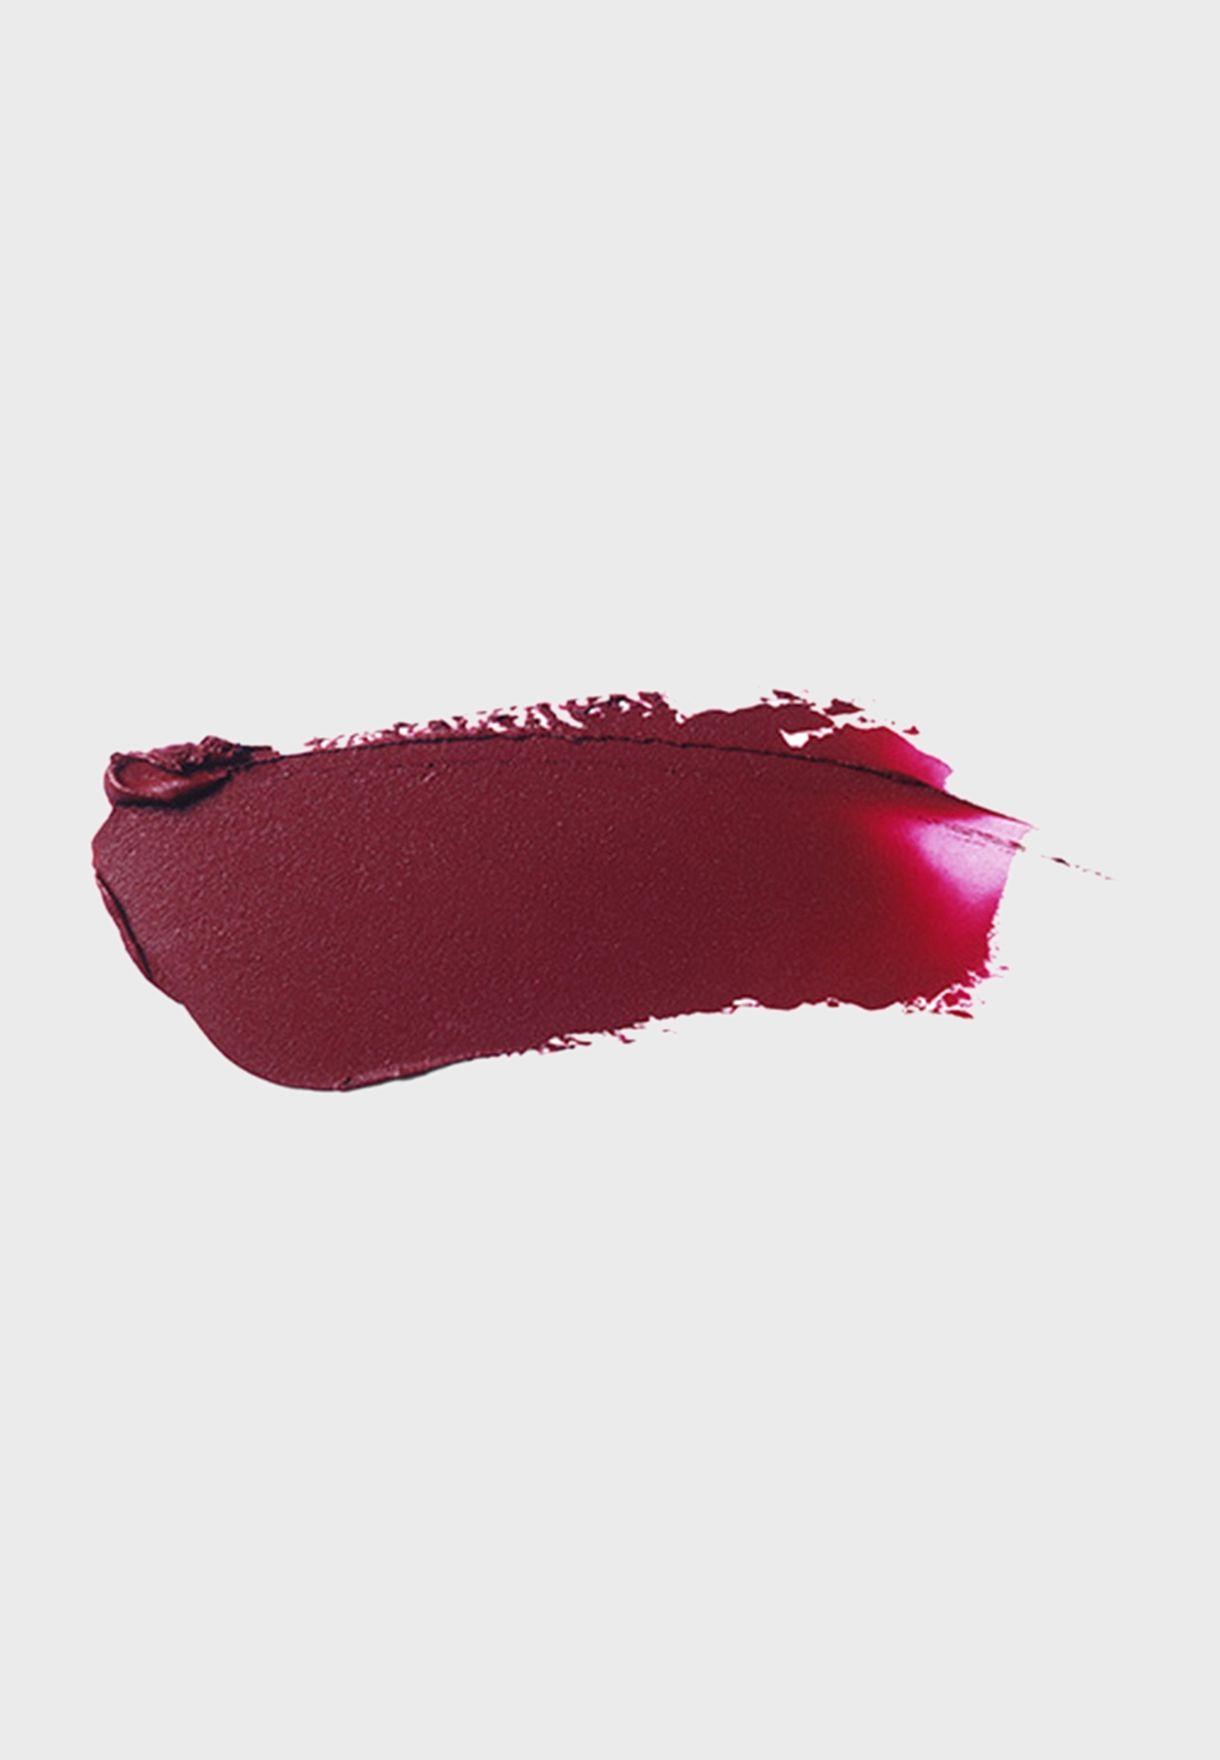 Pure Color Love Lipstick230 Juiced Up